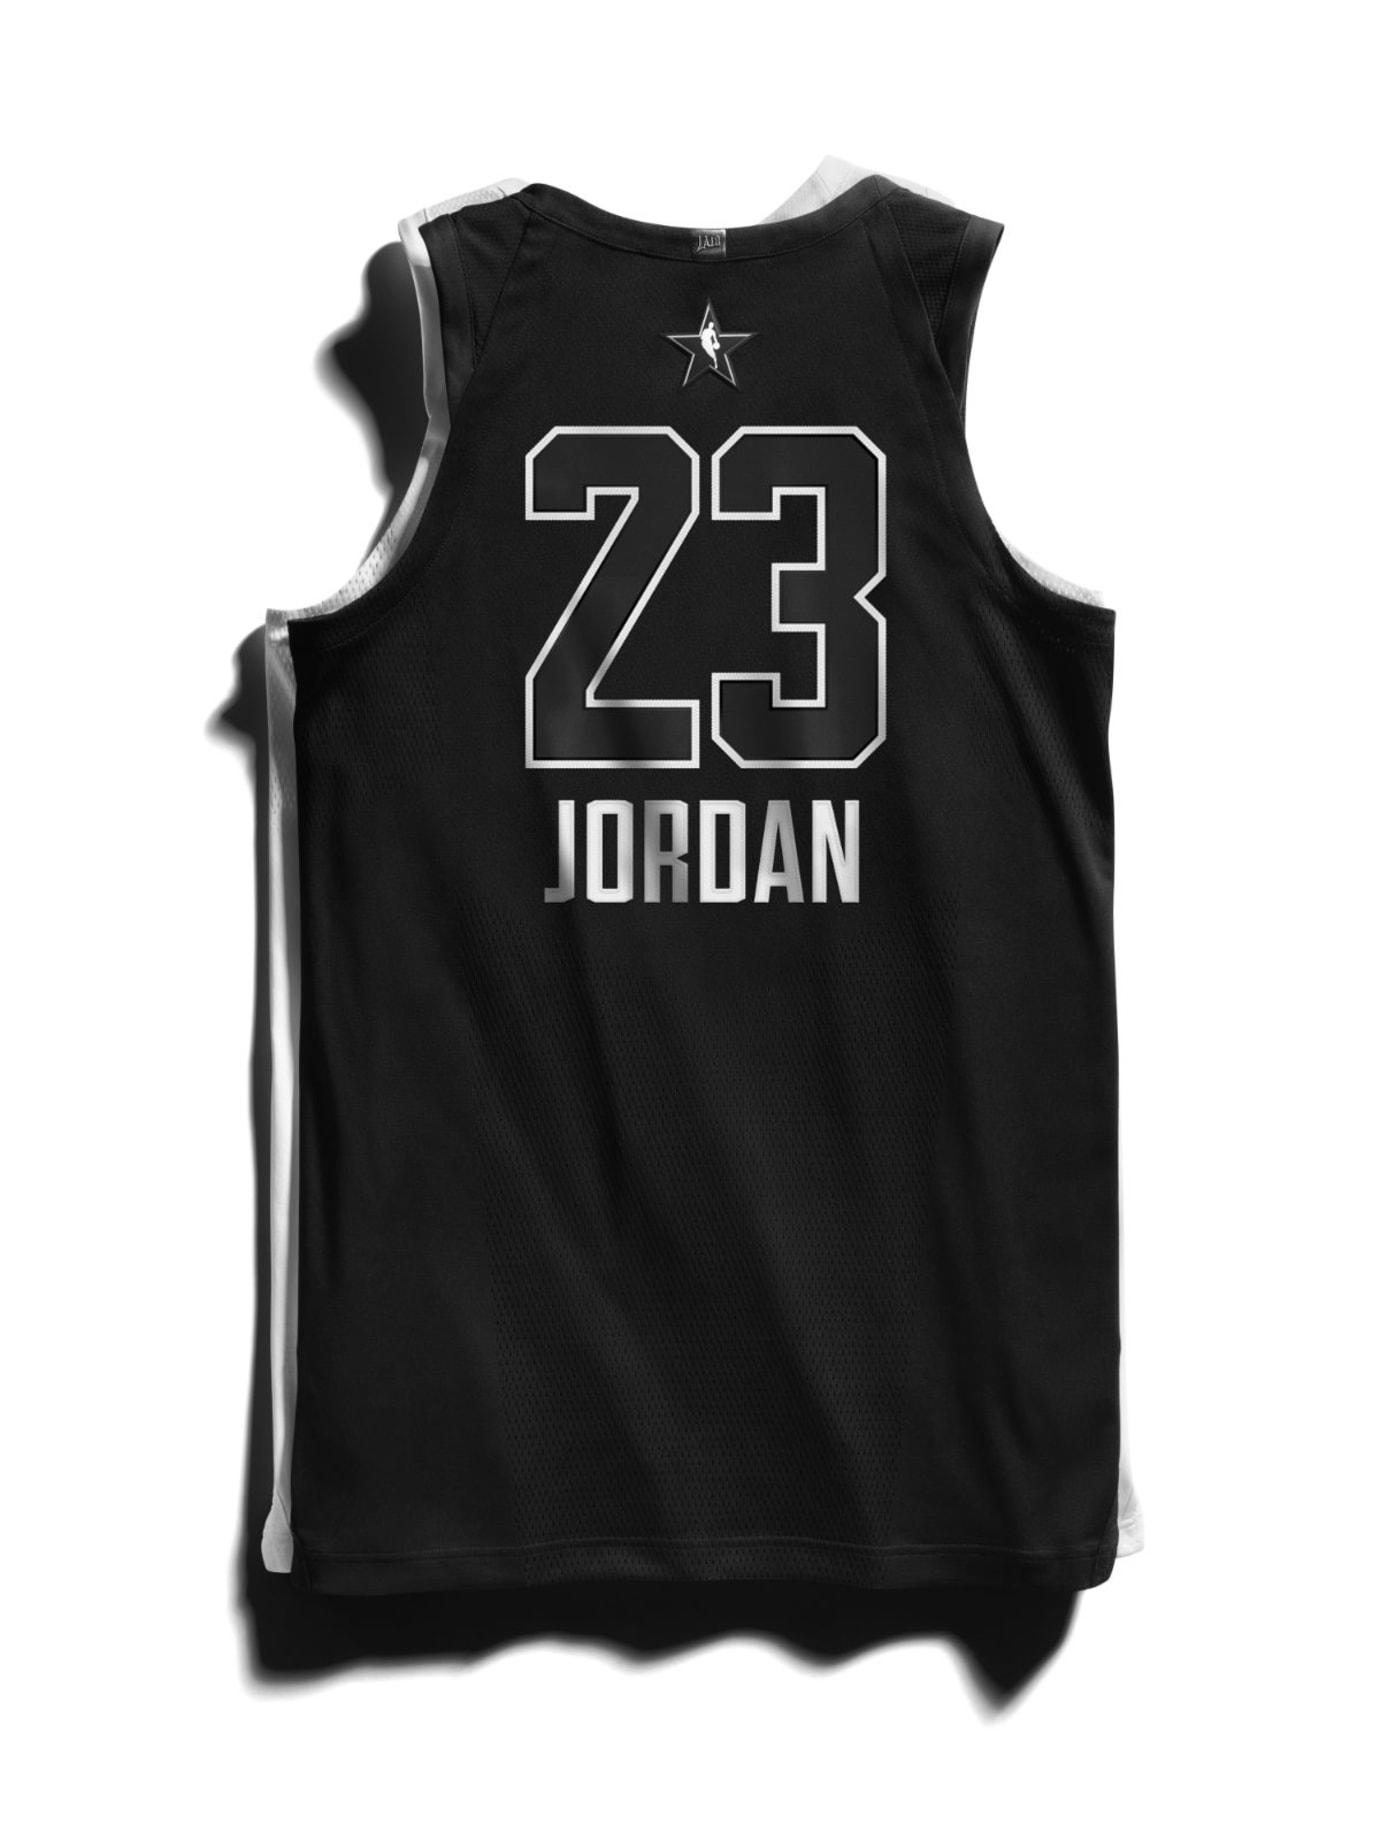 Jordan Brand 2018 NBA All-Star Jerseys Back